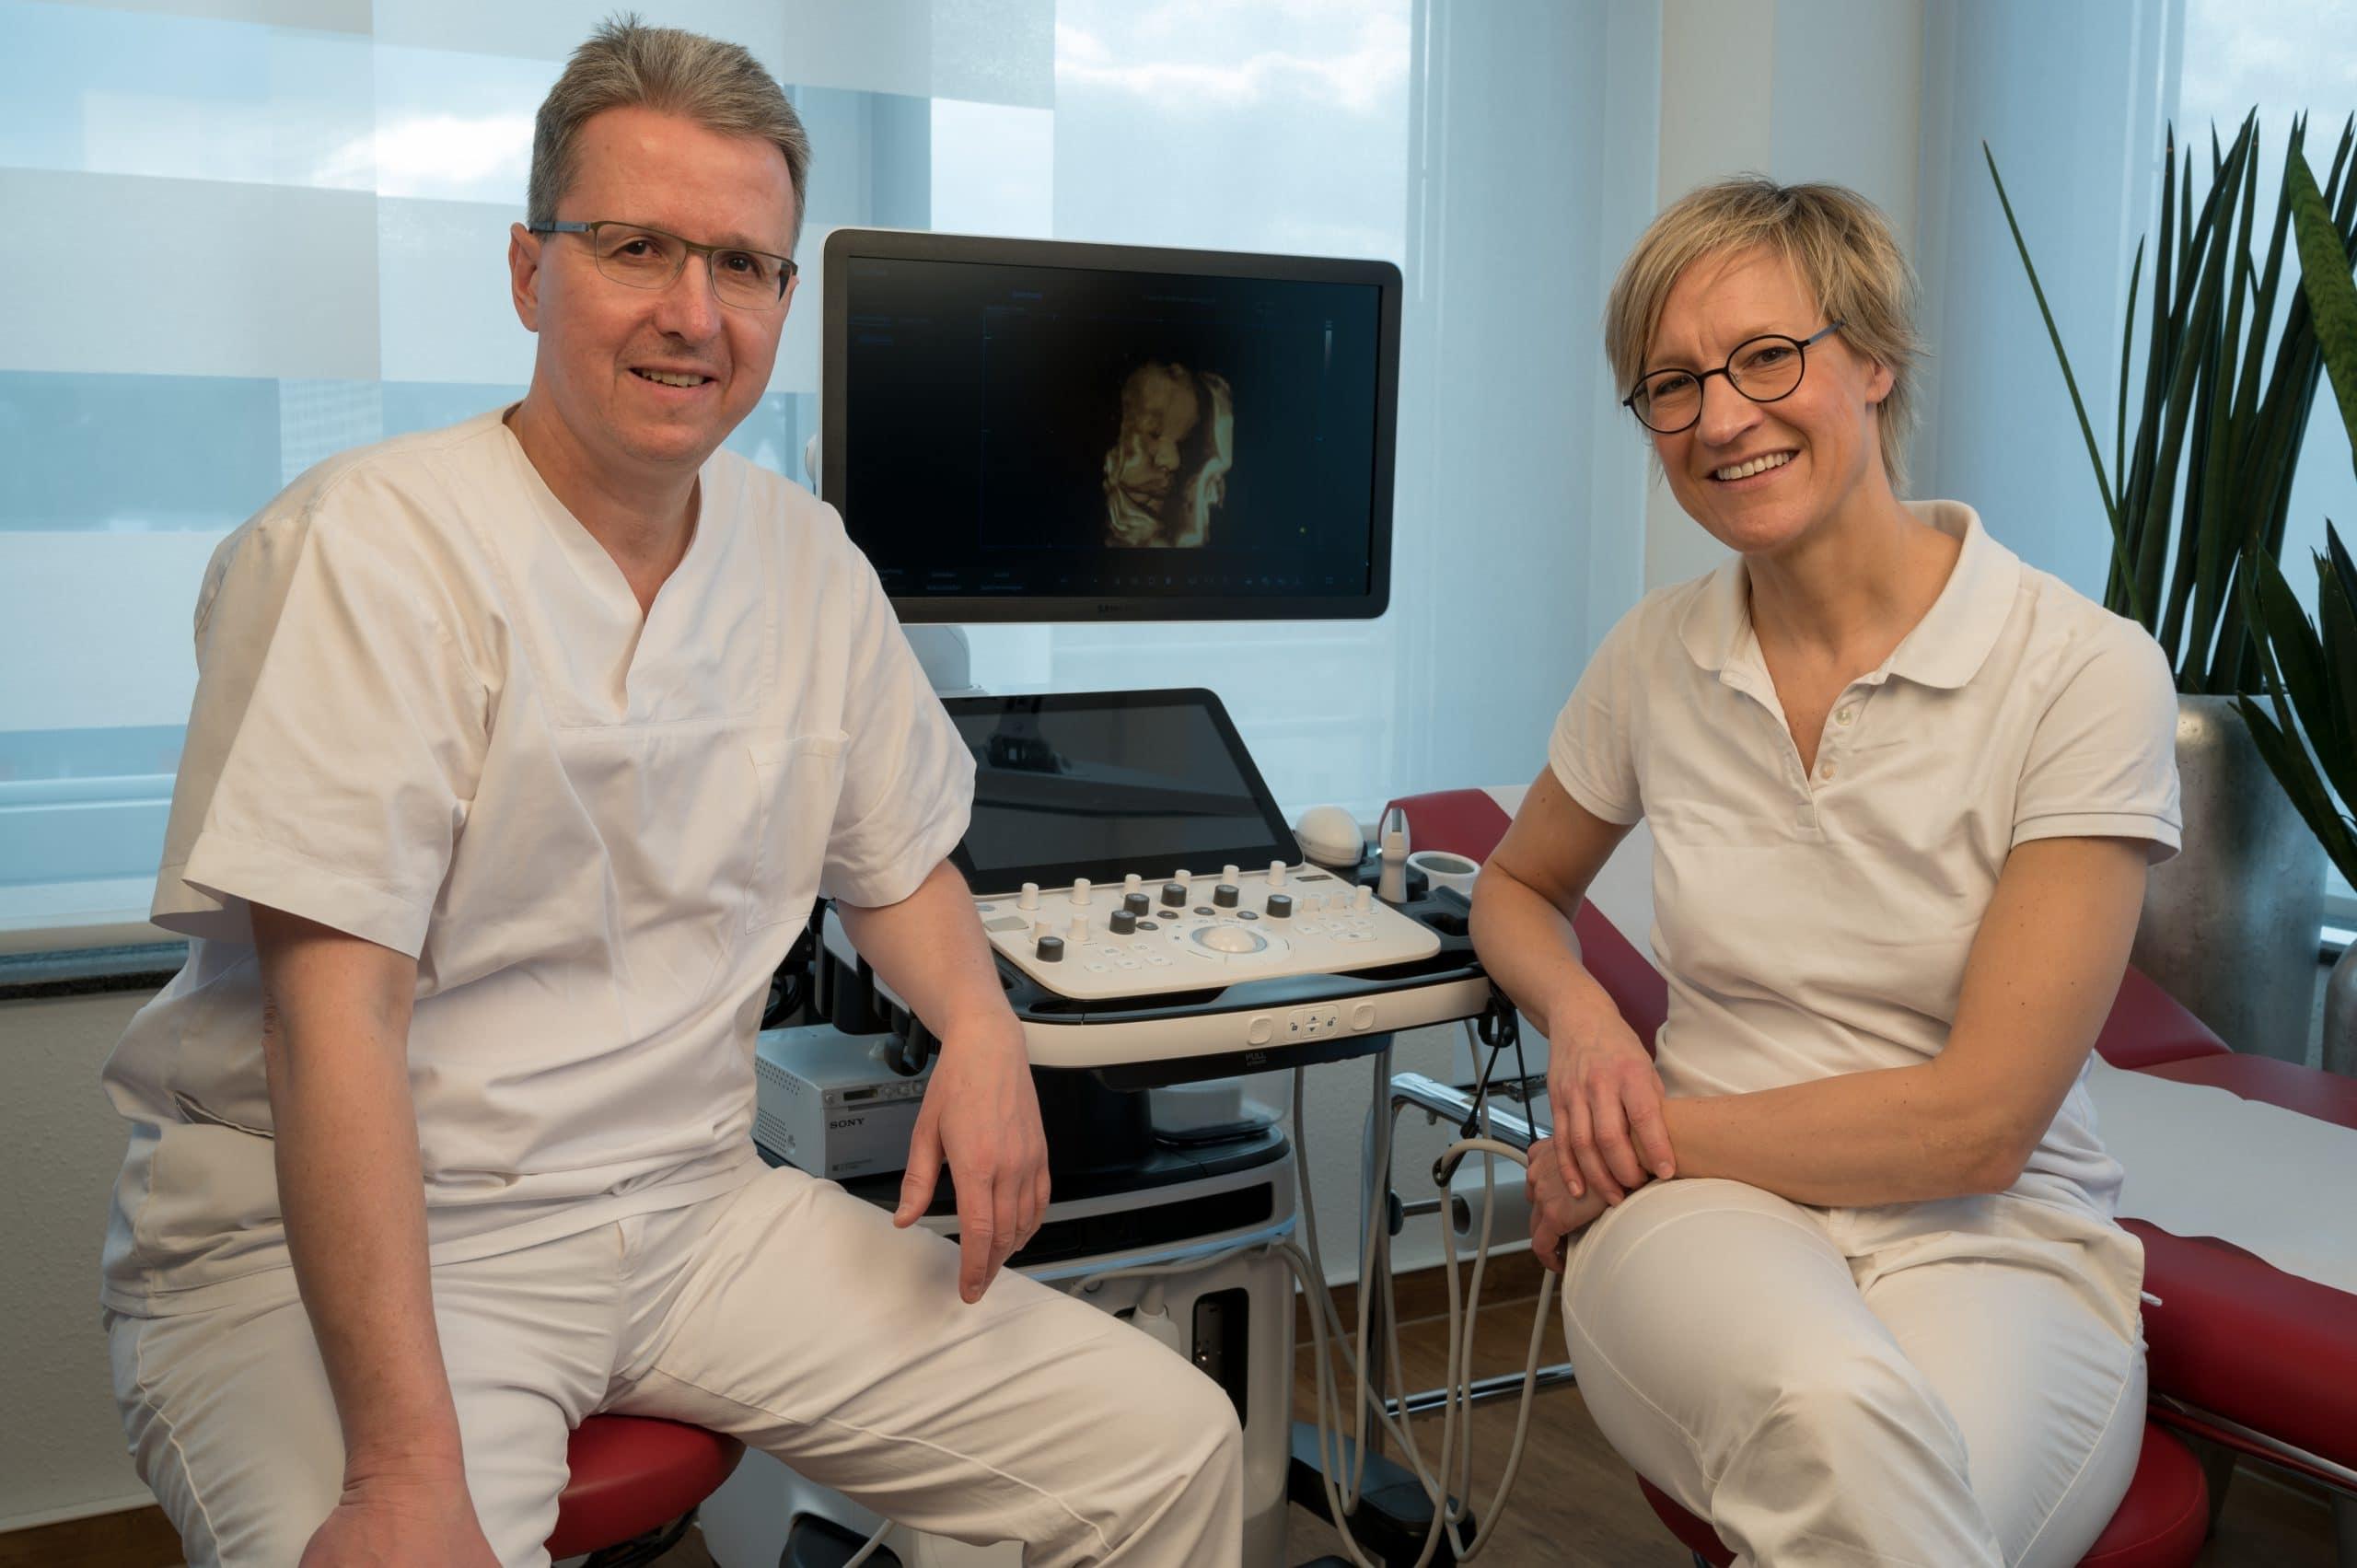 Pränatale Ulraschall Diagnostik Peter Kollertz und Ute Kelkenberg in der Frauenarztpraxis Dr. Englisch.